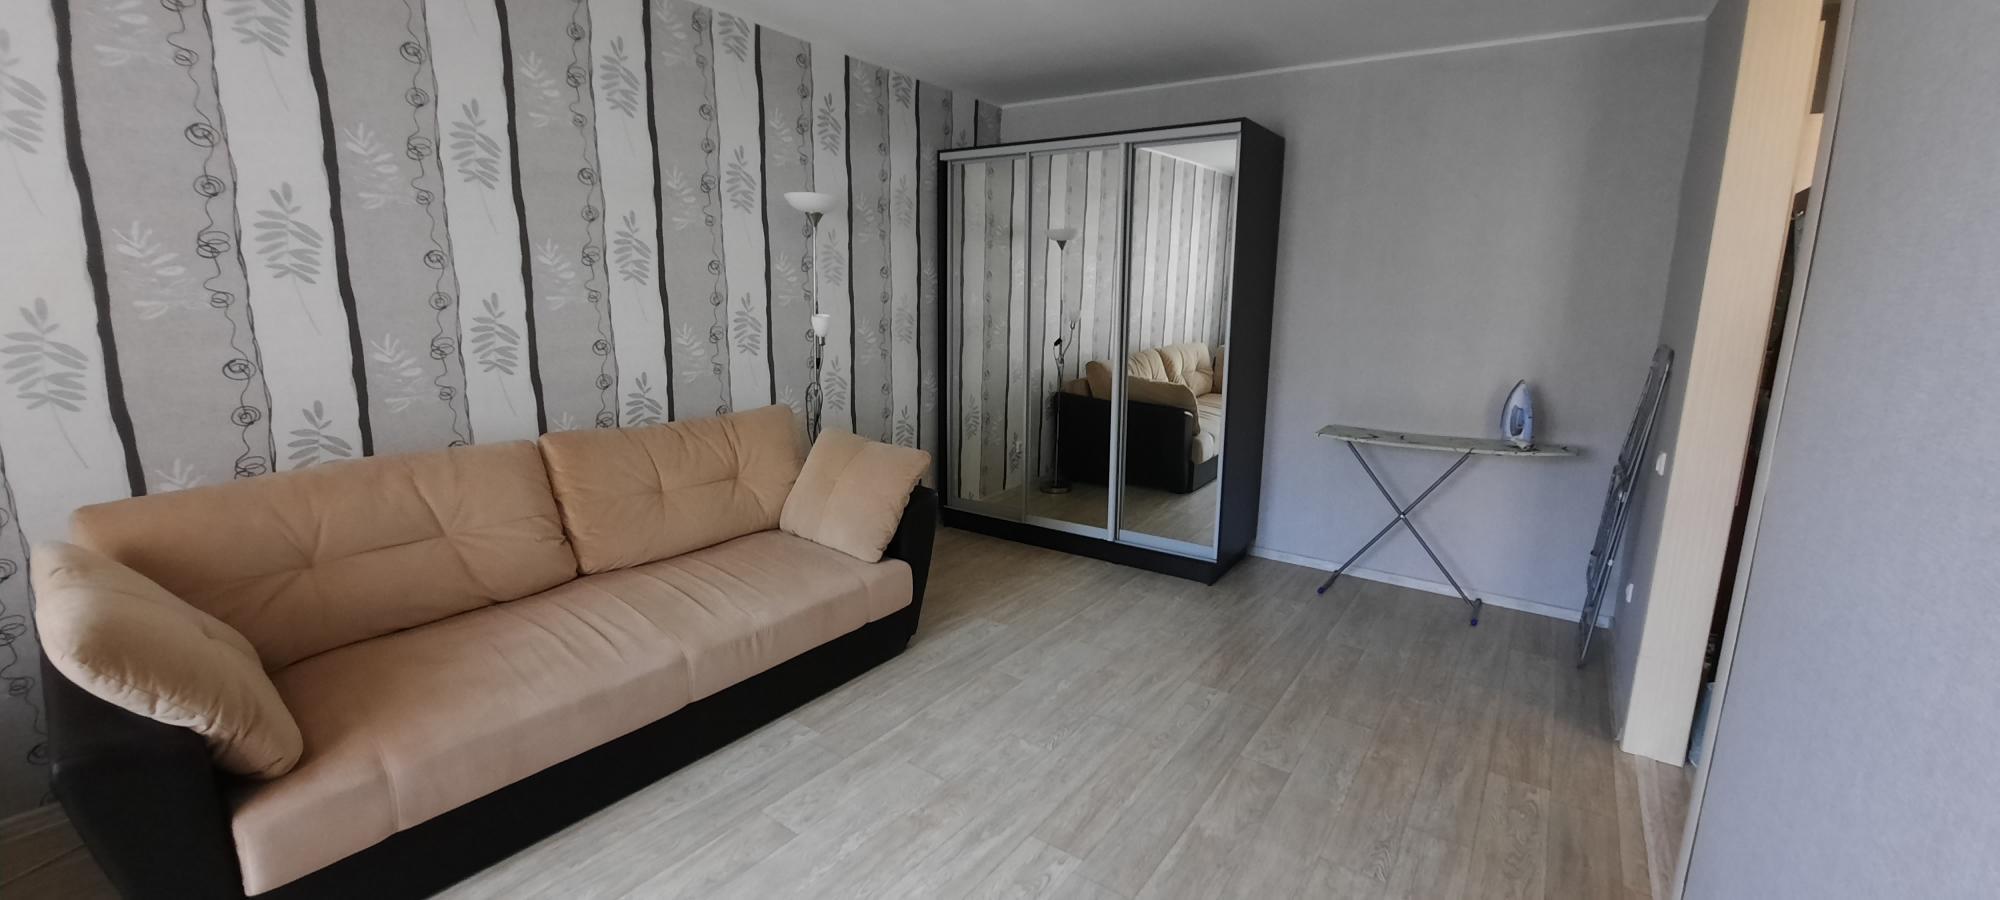 1к квартира Ботанический бульвар, 17 | 17000 | аренда в Красноярске фото 1